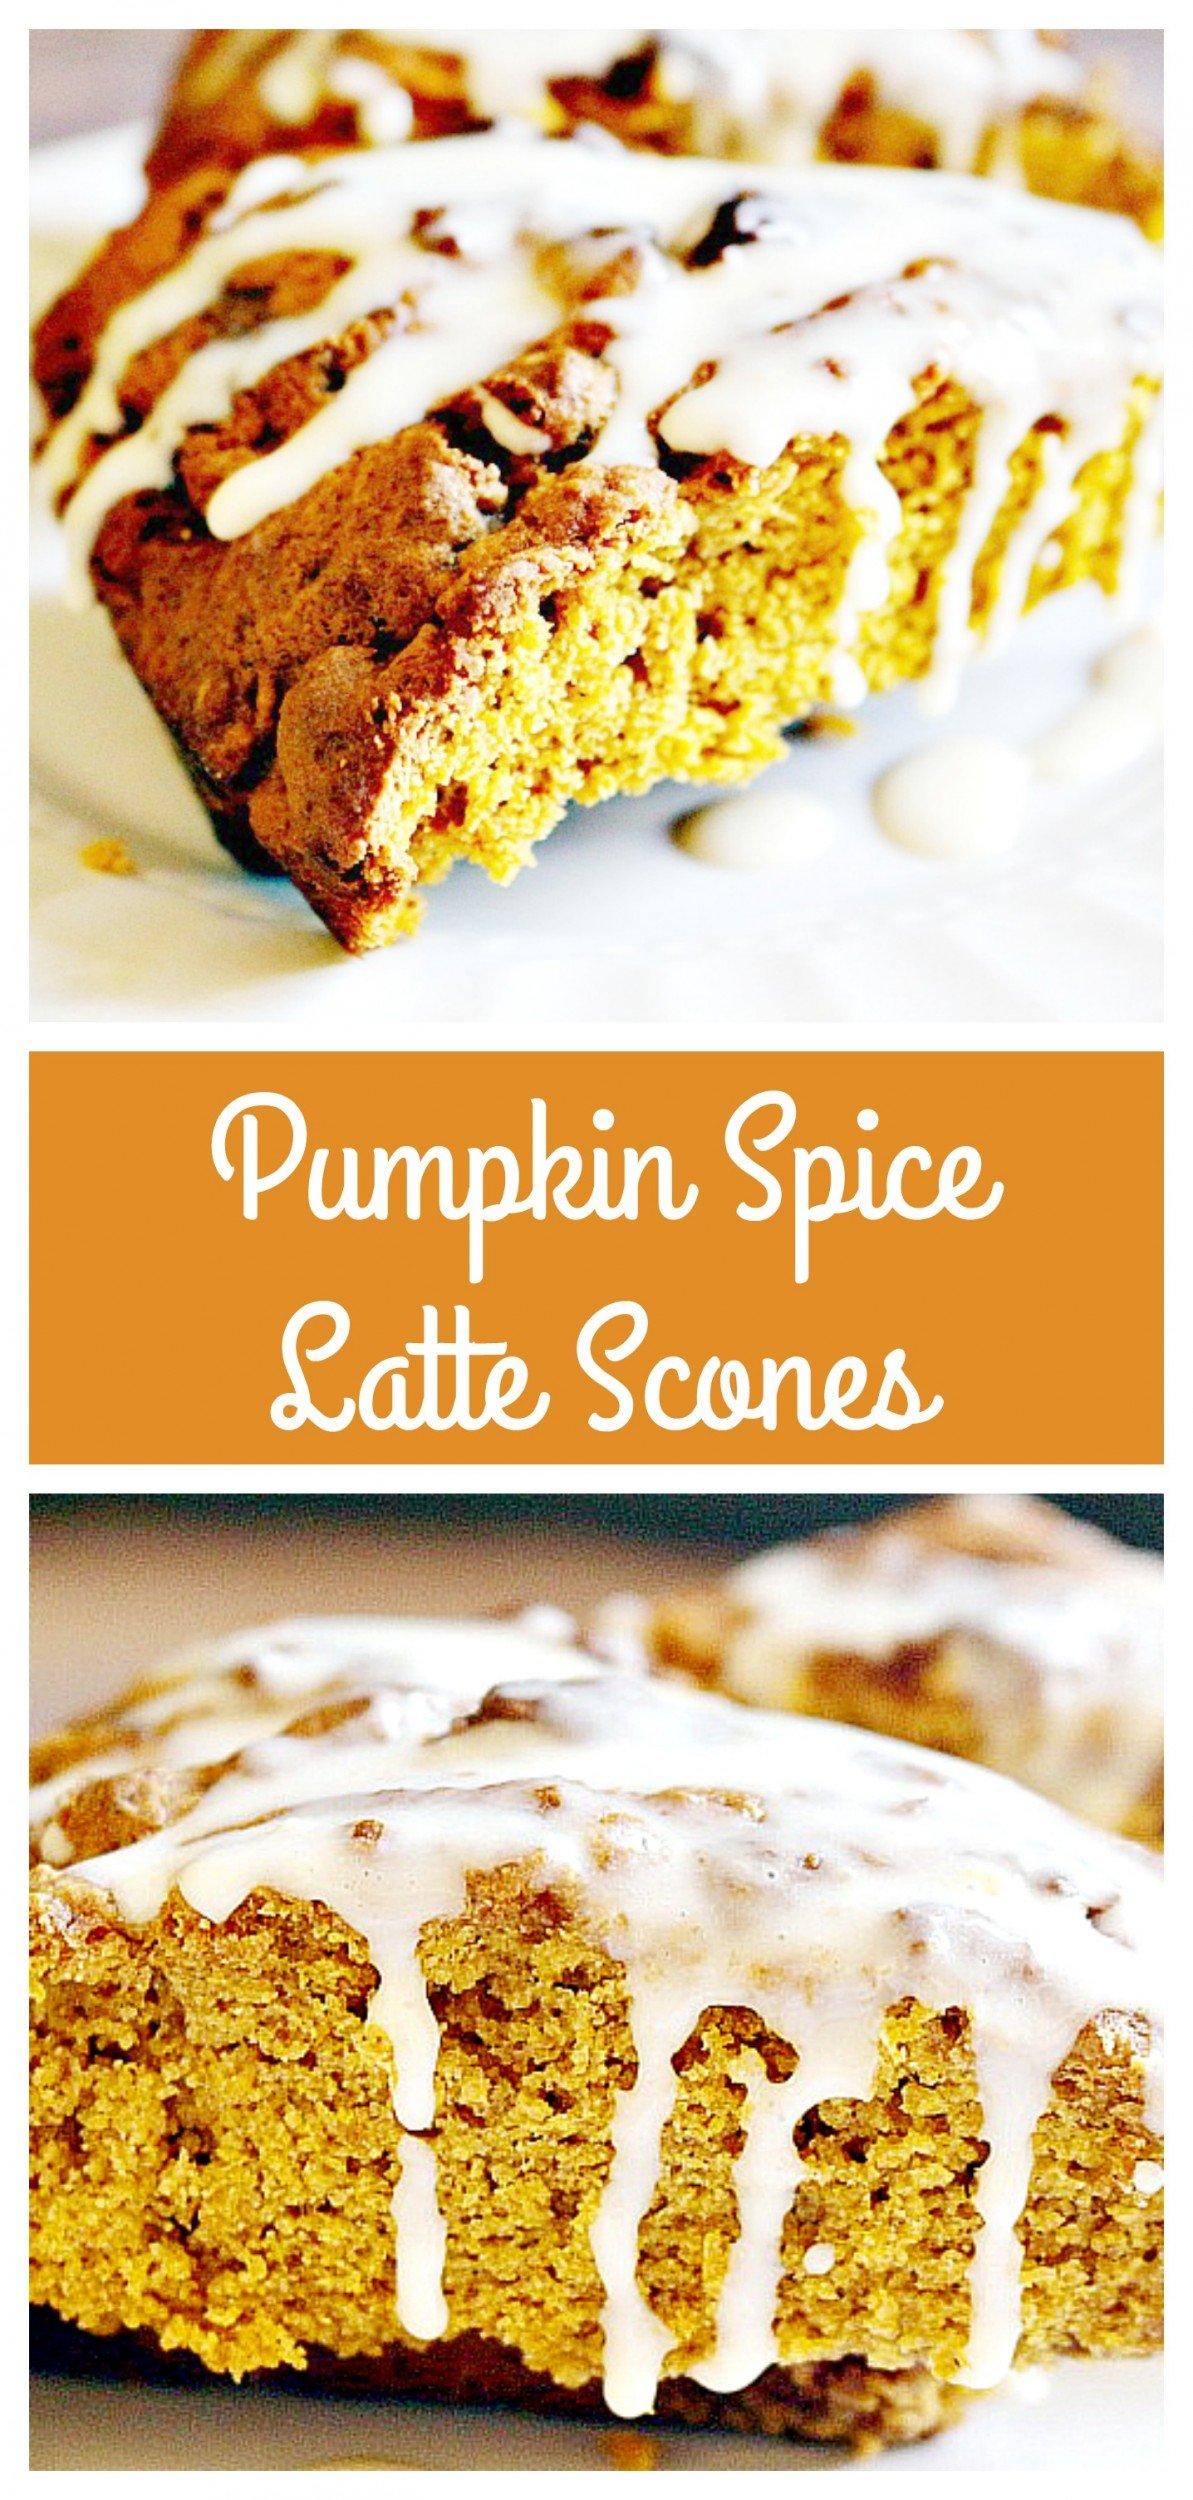 Pumpkin Spice Latte Scones | Golden spiced pumpkin scones with the rich taste of espresso and a light sugar-espresso glaze.